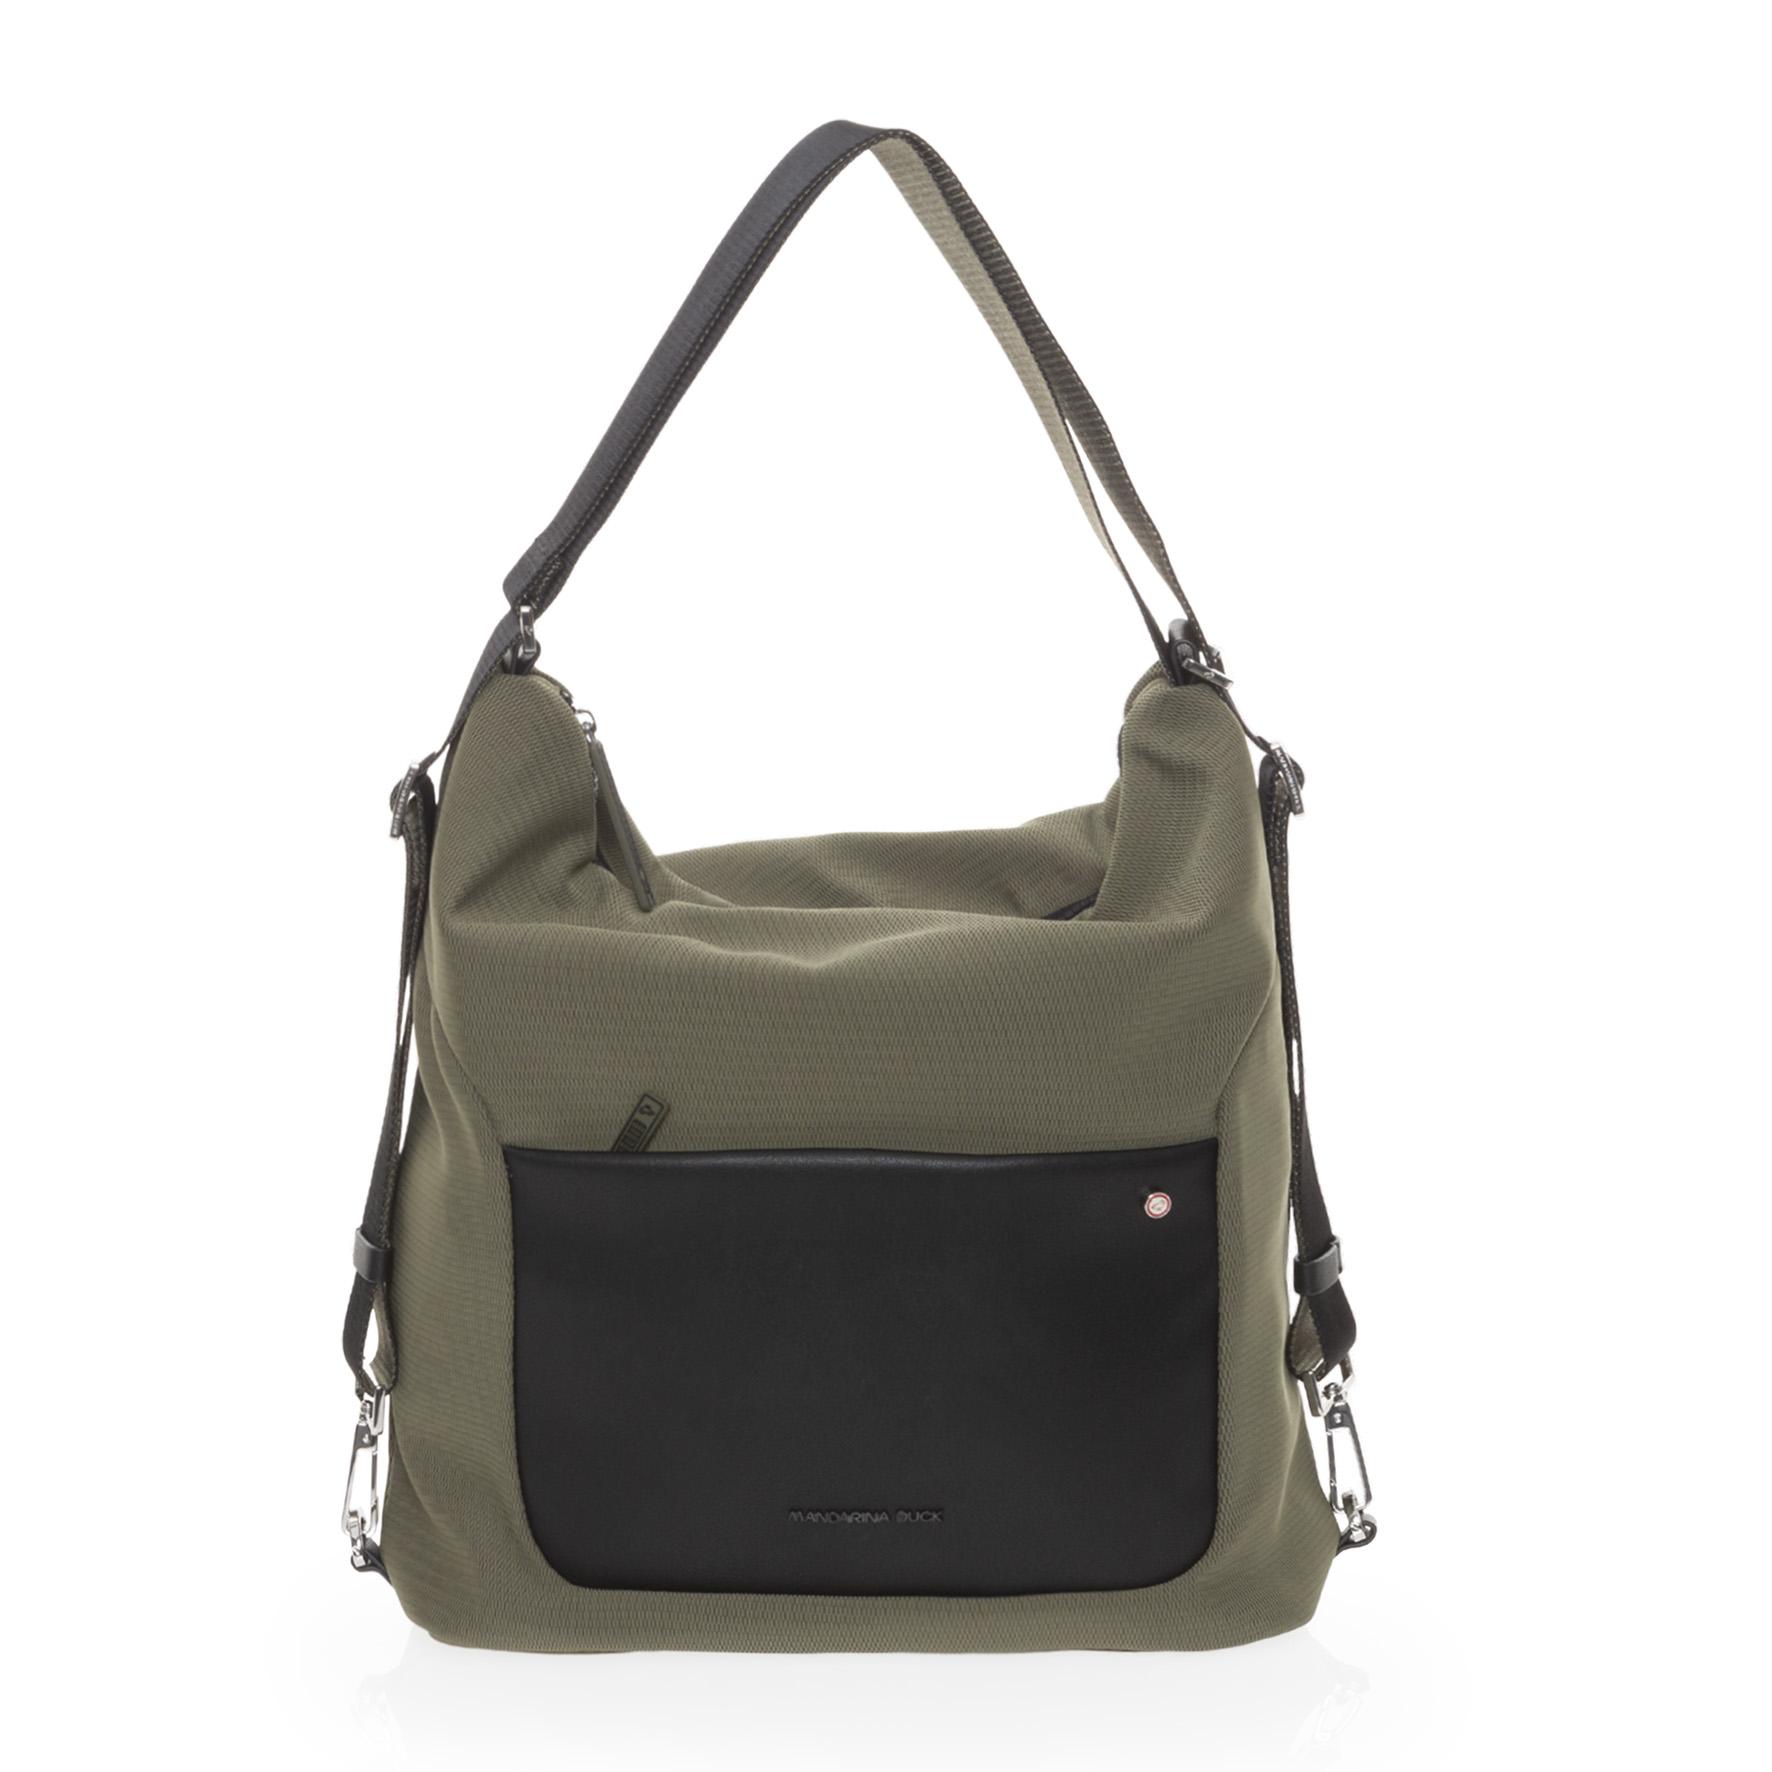 VBT06 Camden bolso mochila verde militar